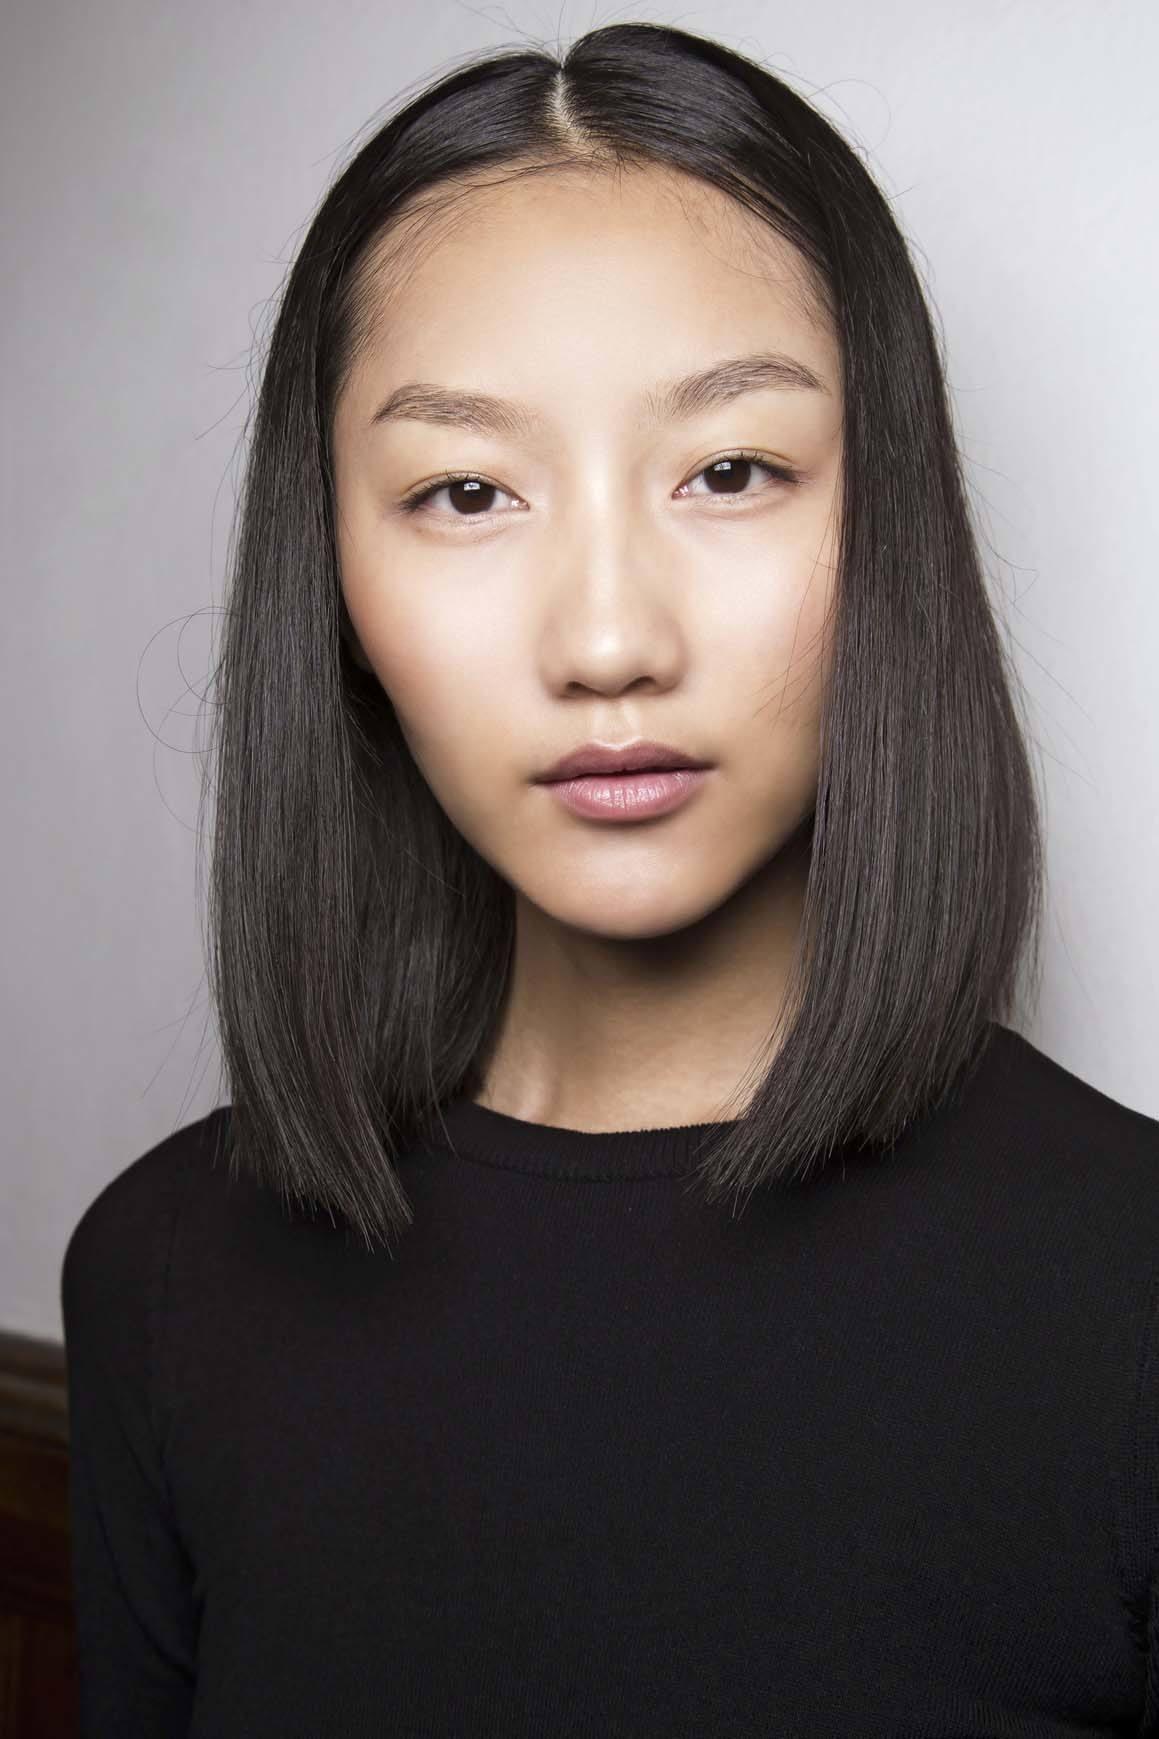 Wanita asia dengan model rambut layer pendek pada rambut bob